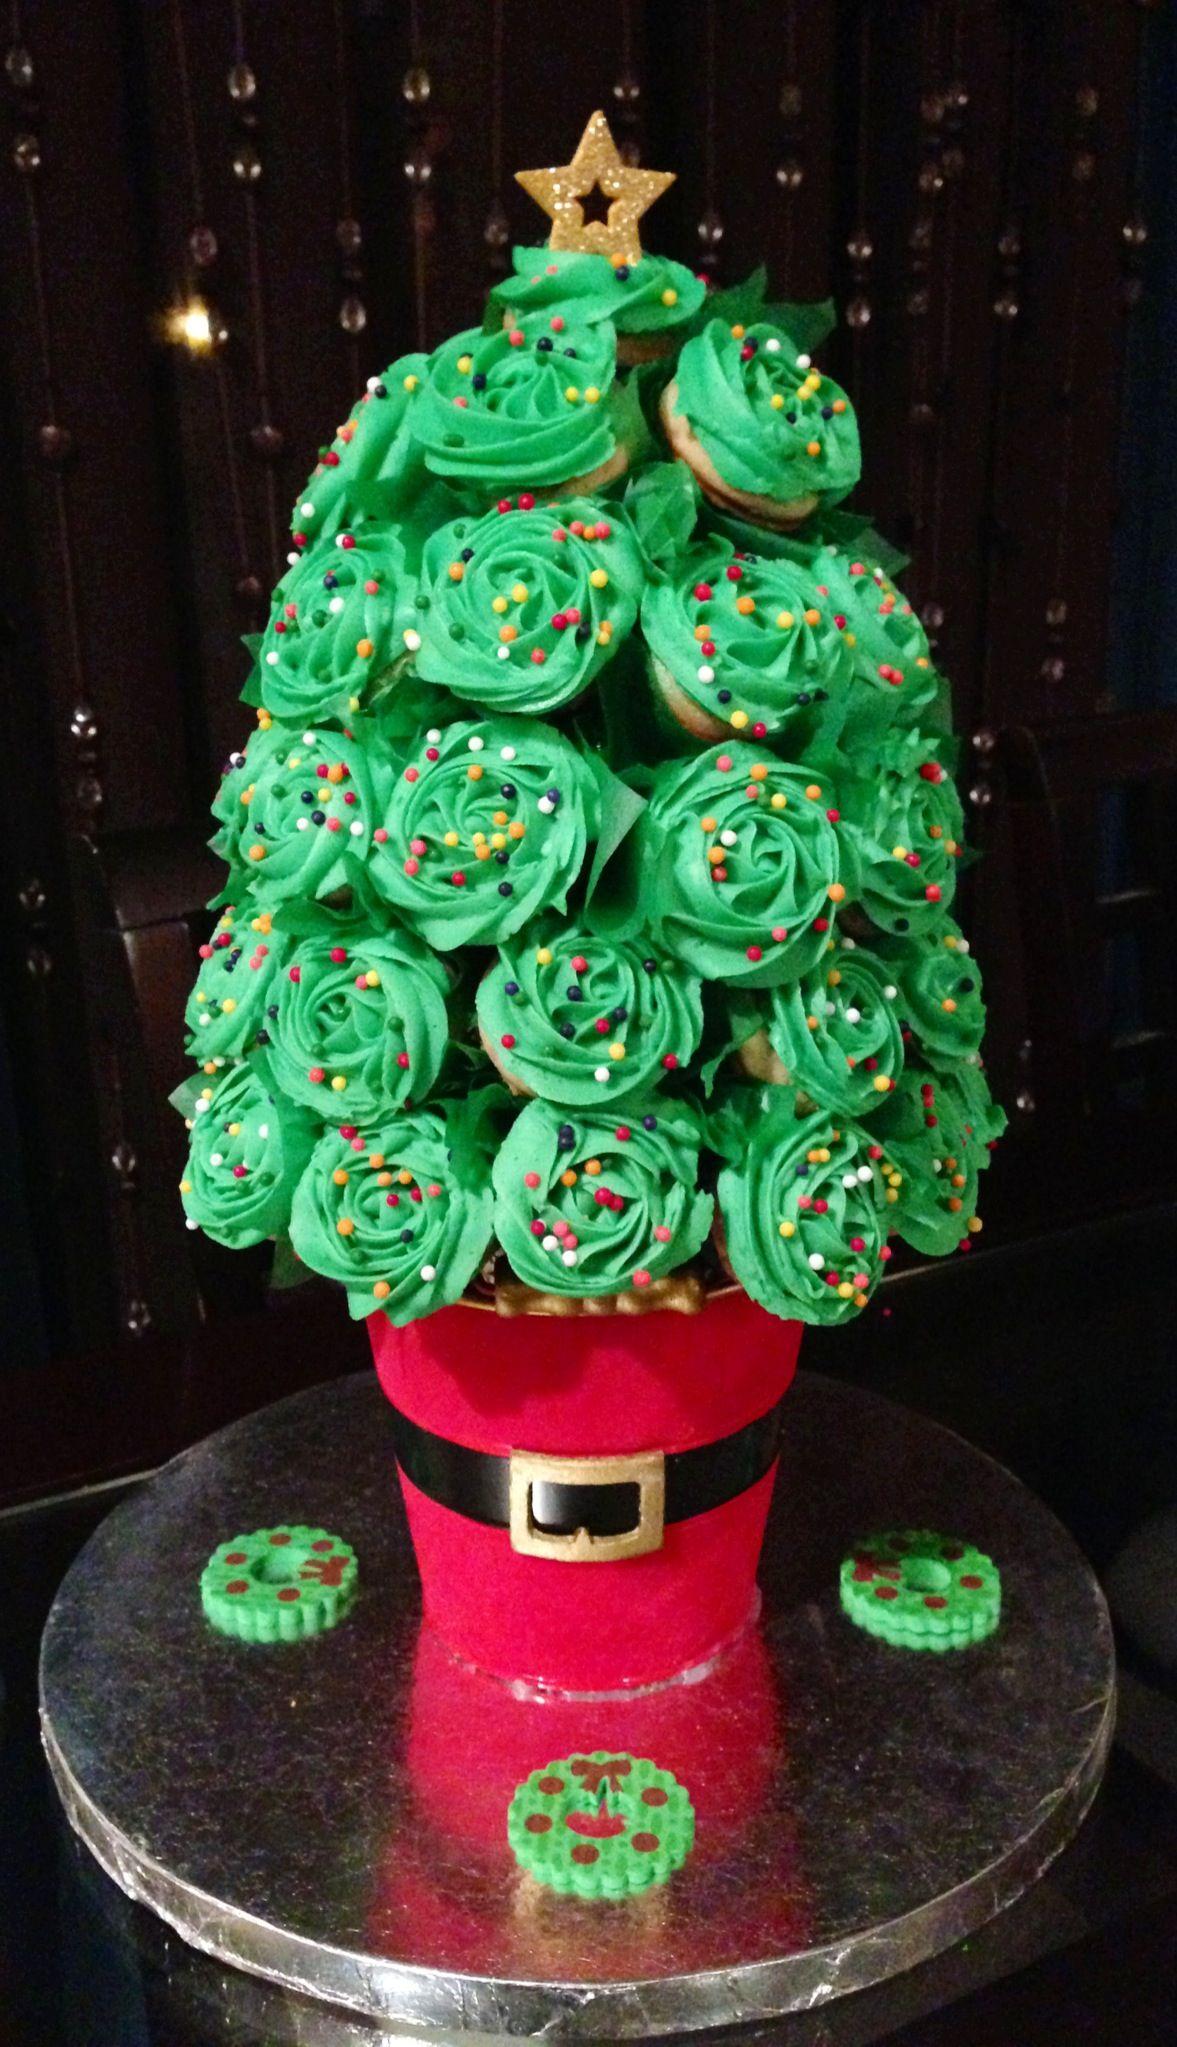 cupcake christmas tree bouquet essen weihnachtsgeb ck. Black Bedroom Furniture Sets. Home Design Ideas